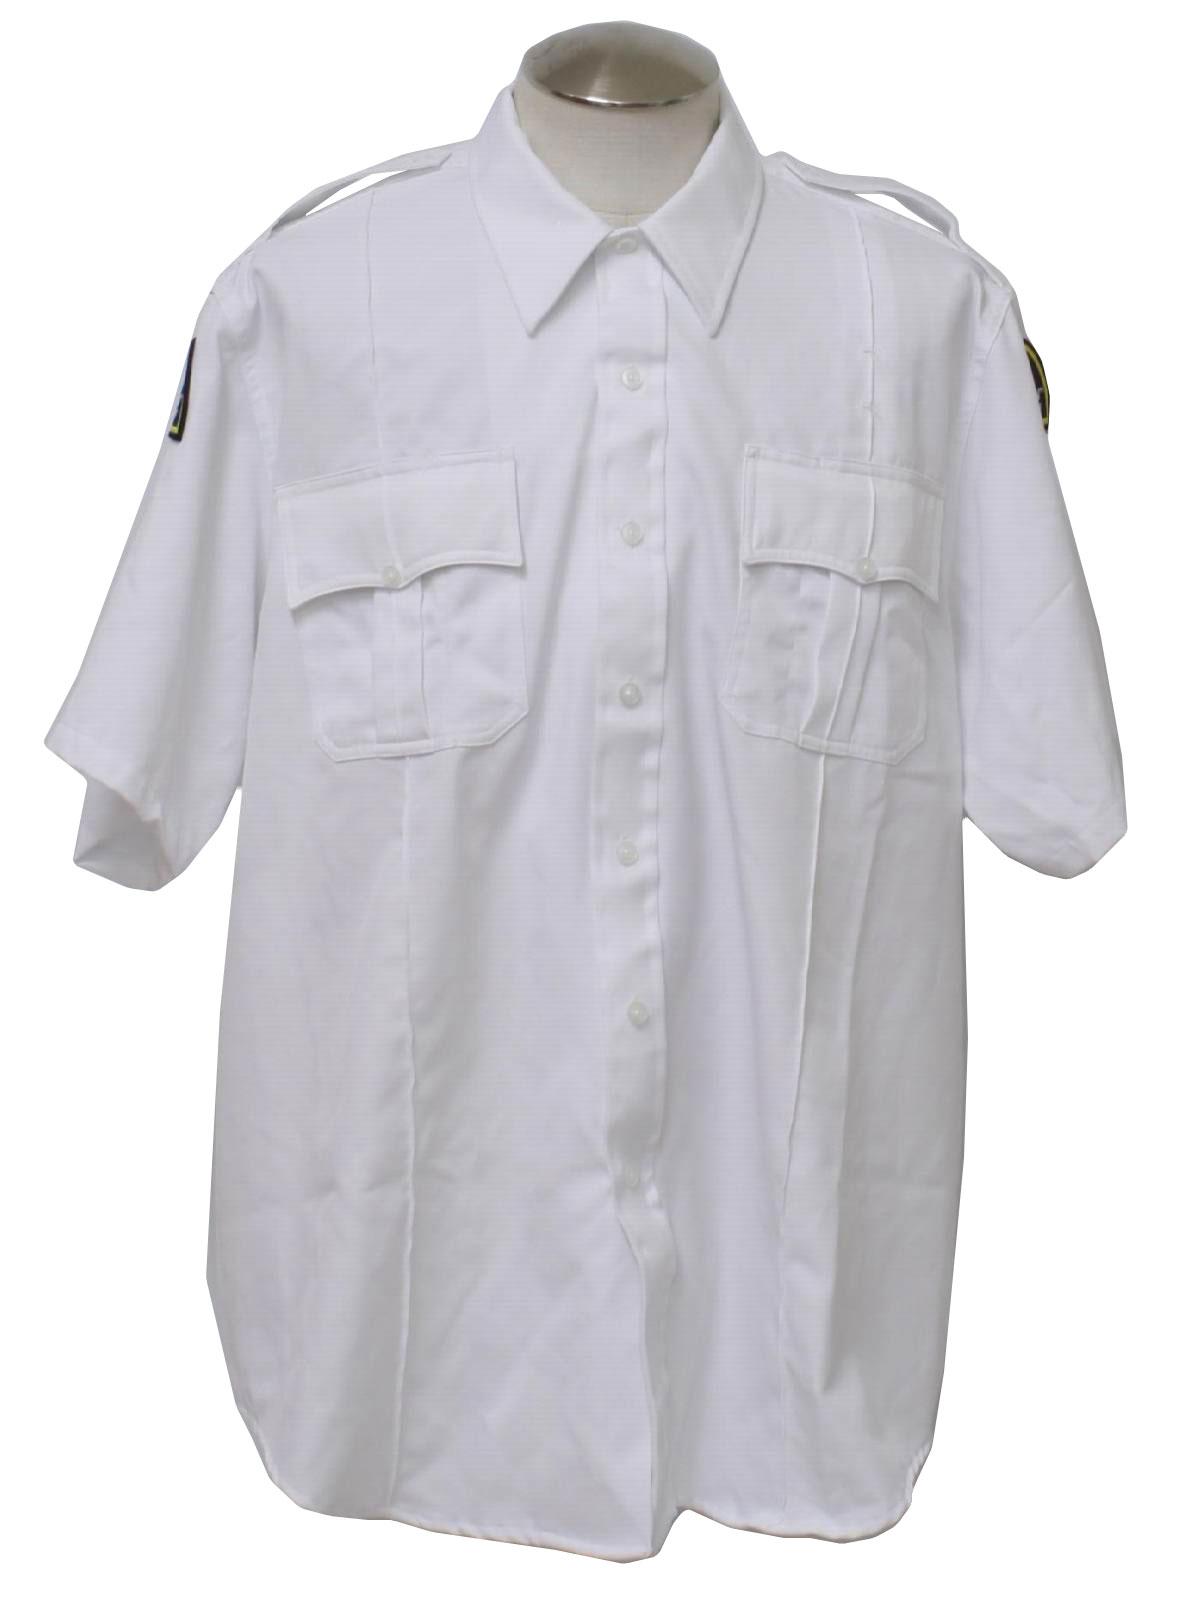 1990's Vintage Martins Shirt: 90s -Martins- Mens white ...